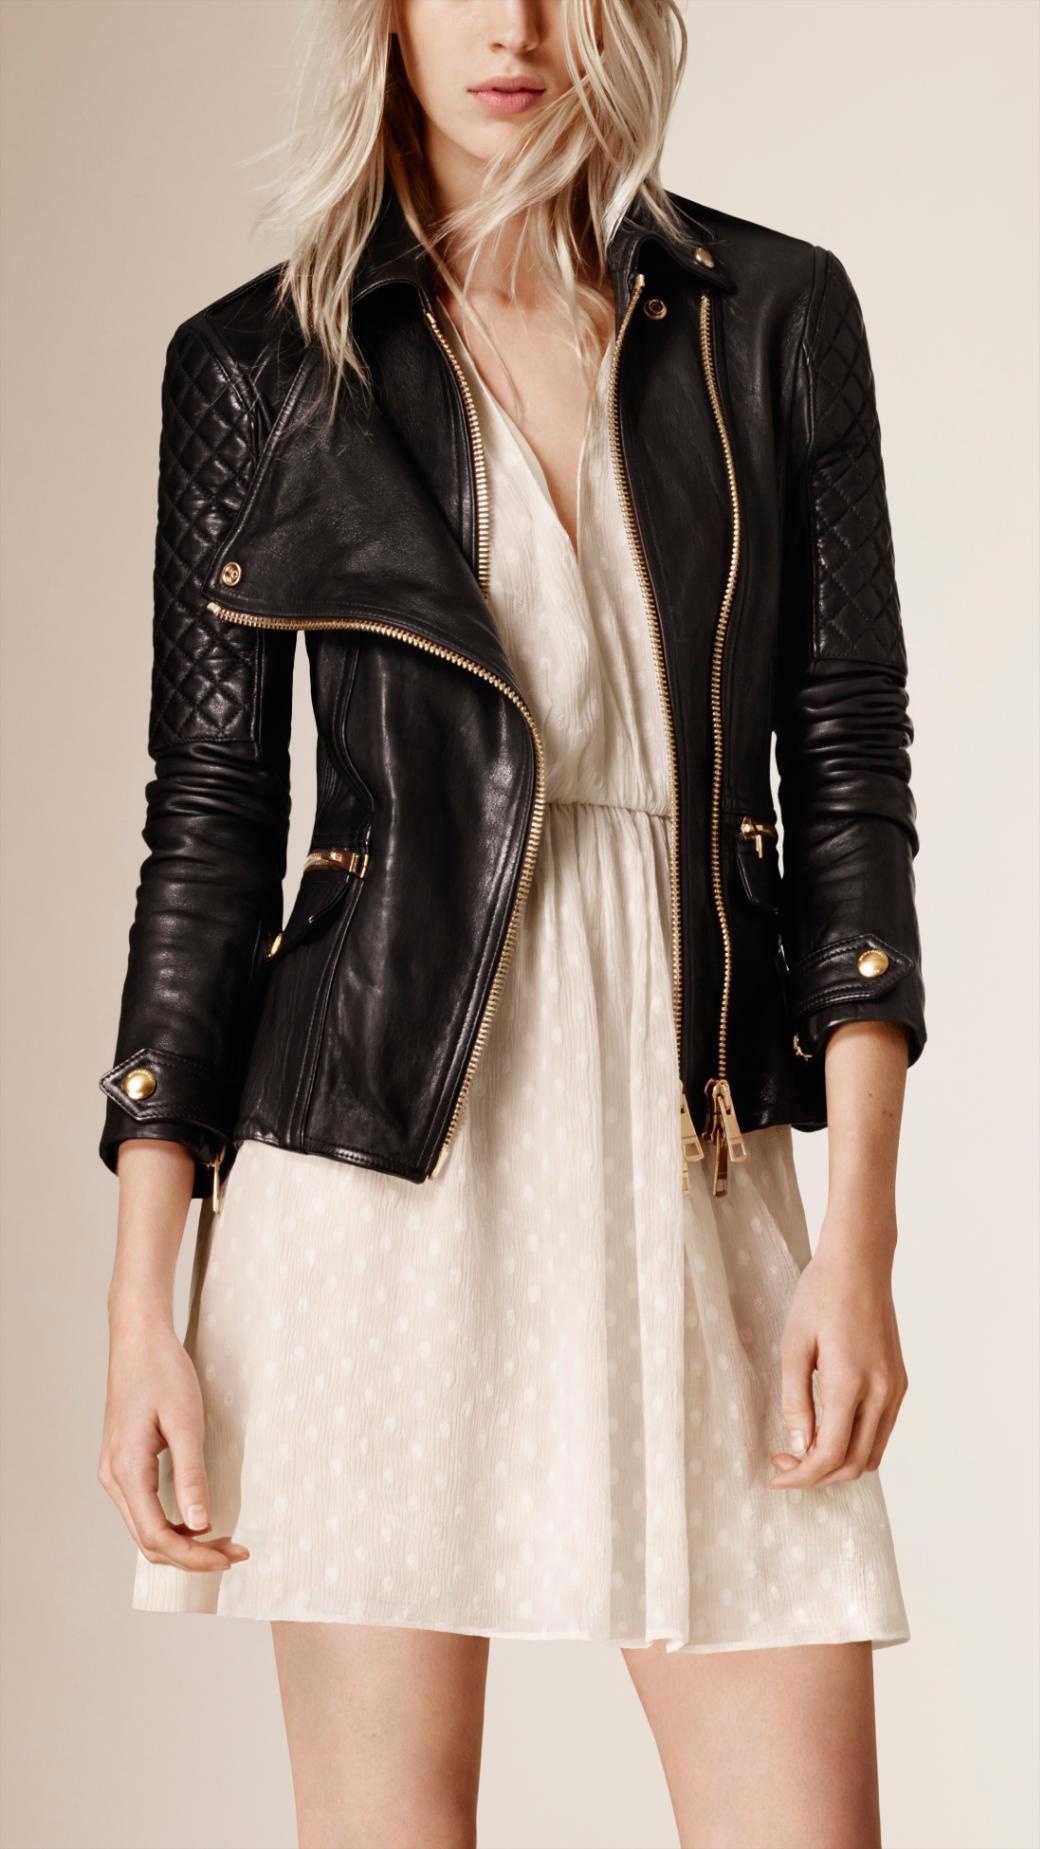 Leather jacket uniqlo - Burberry Diamond Quilt Detail Leather Biker Jacket